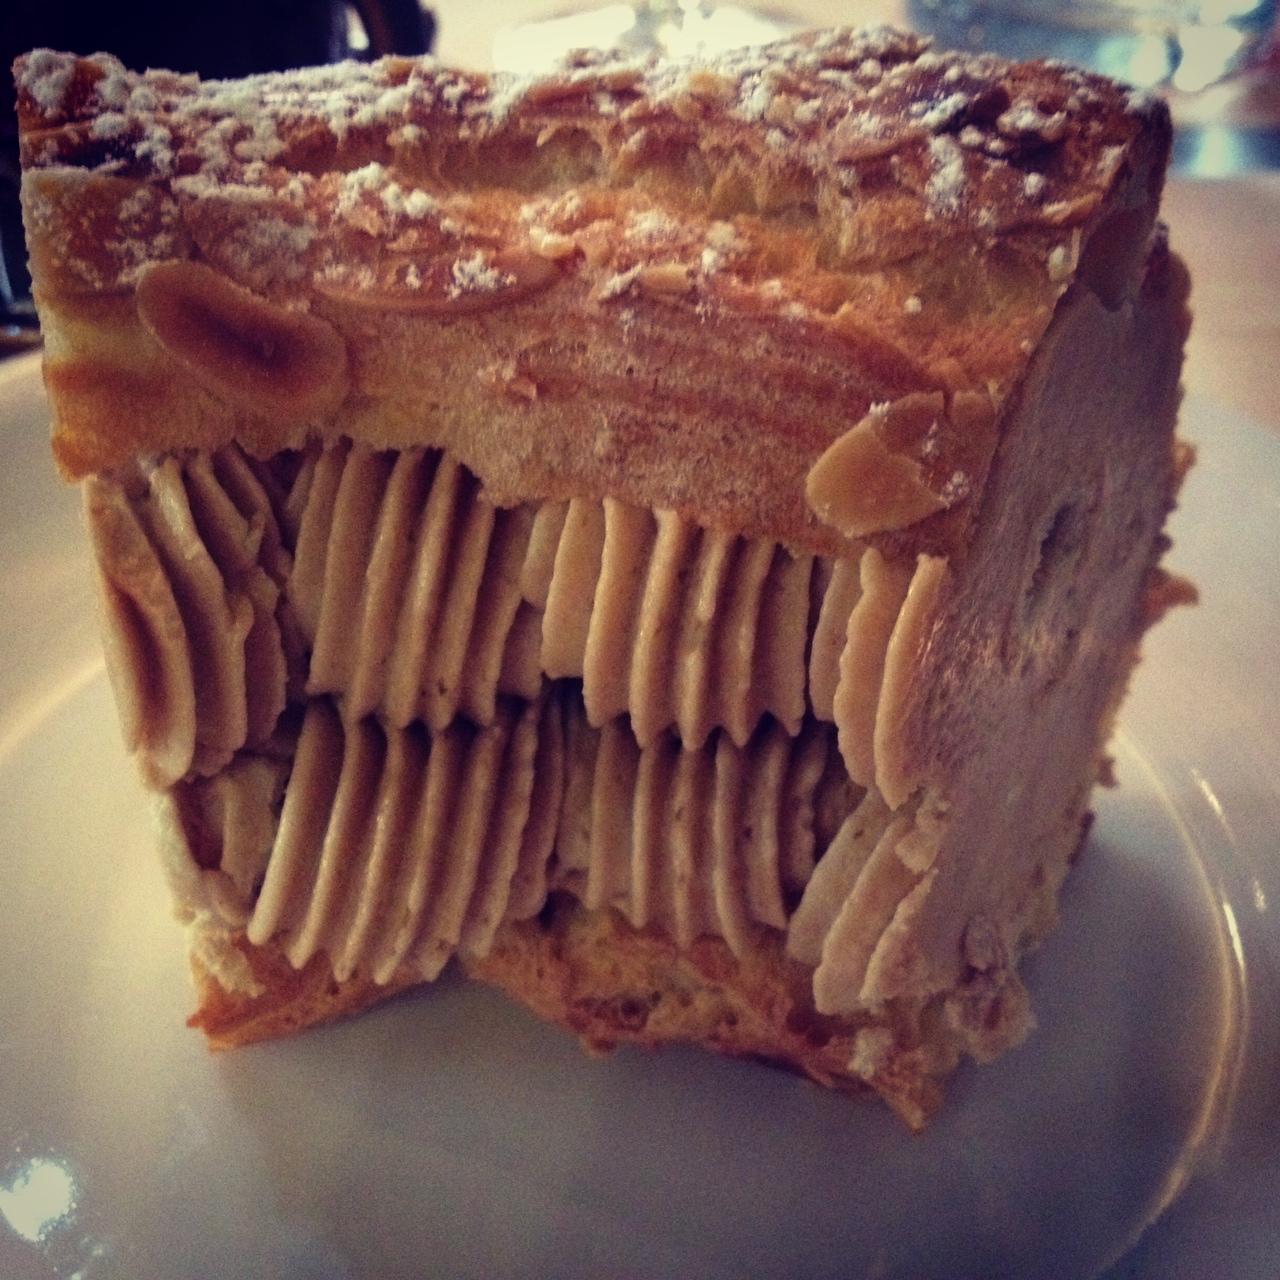 paris_brest dessert